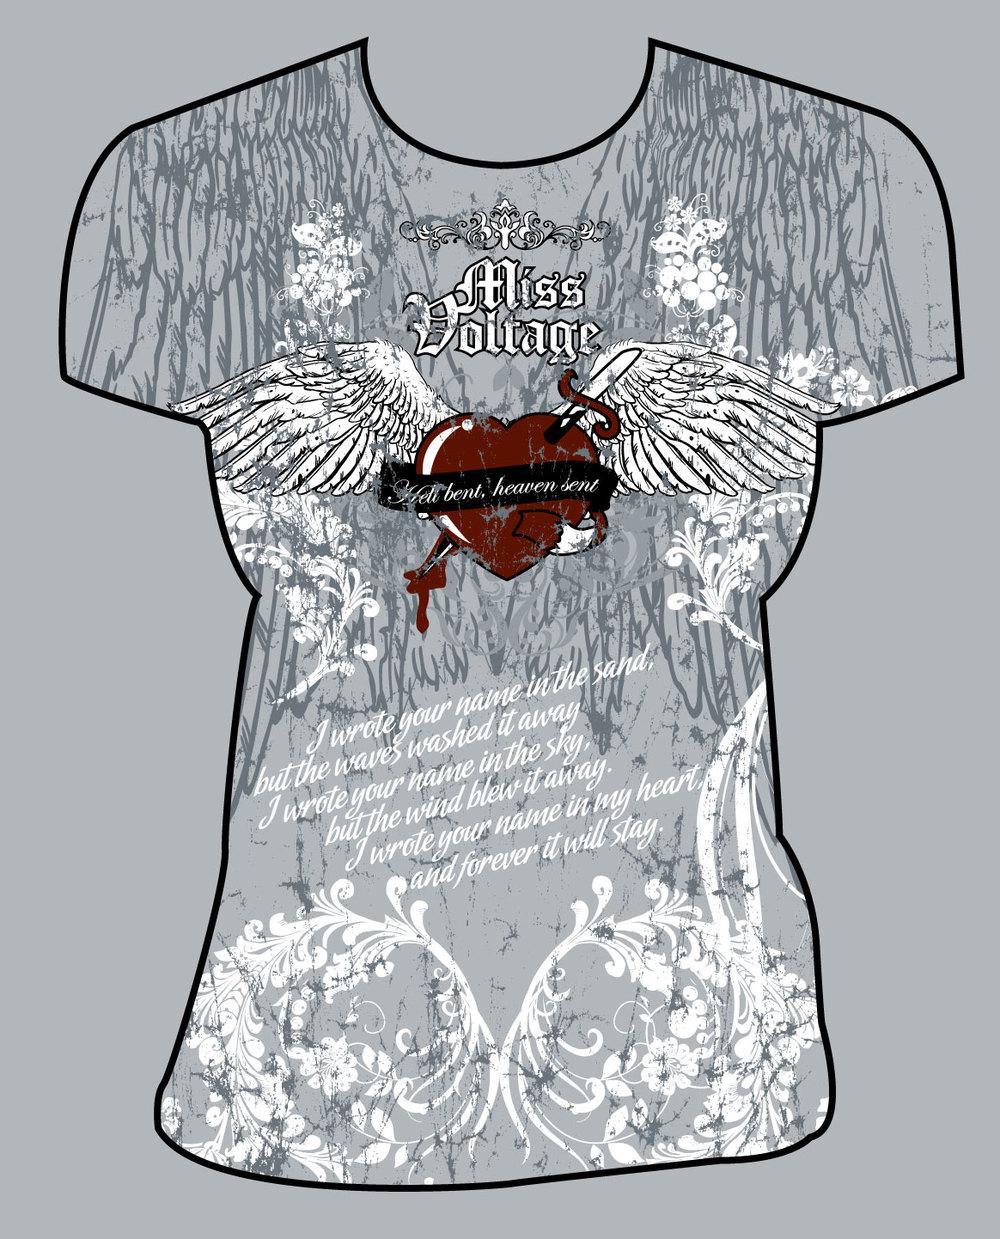 Heart-with-wings.jpg